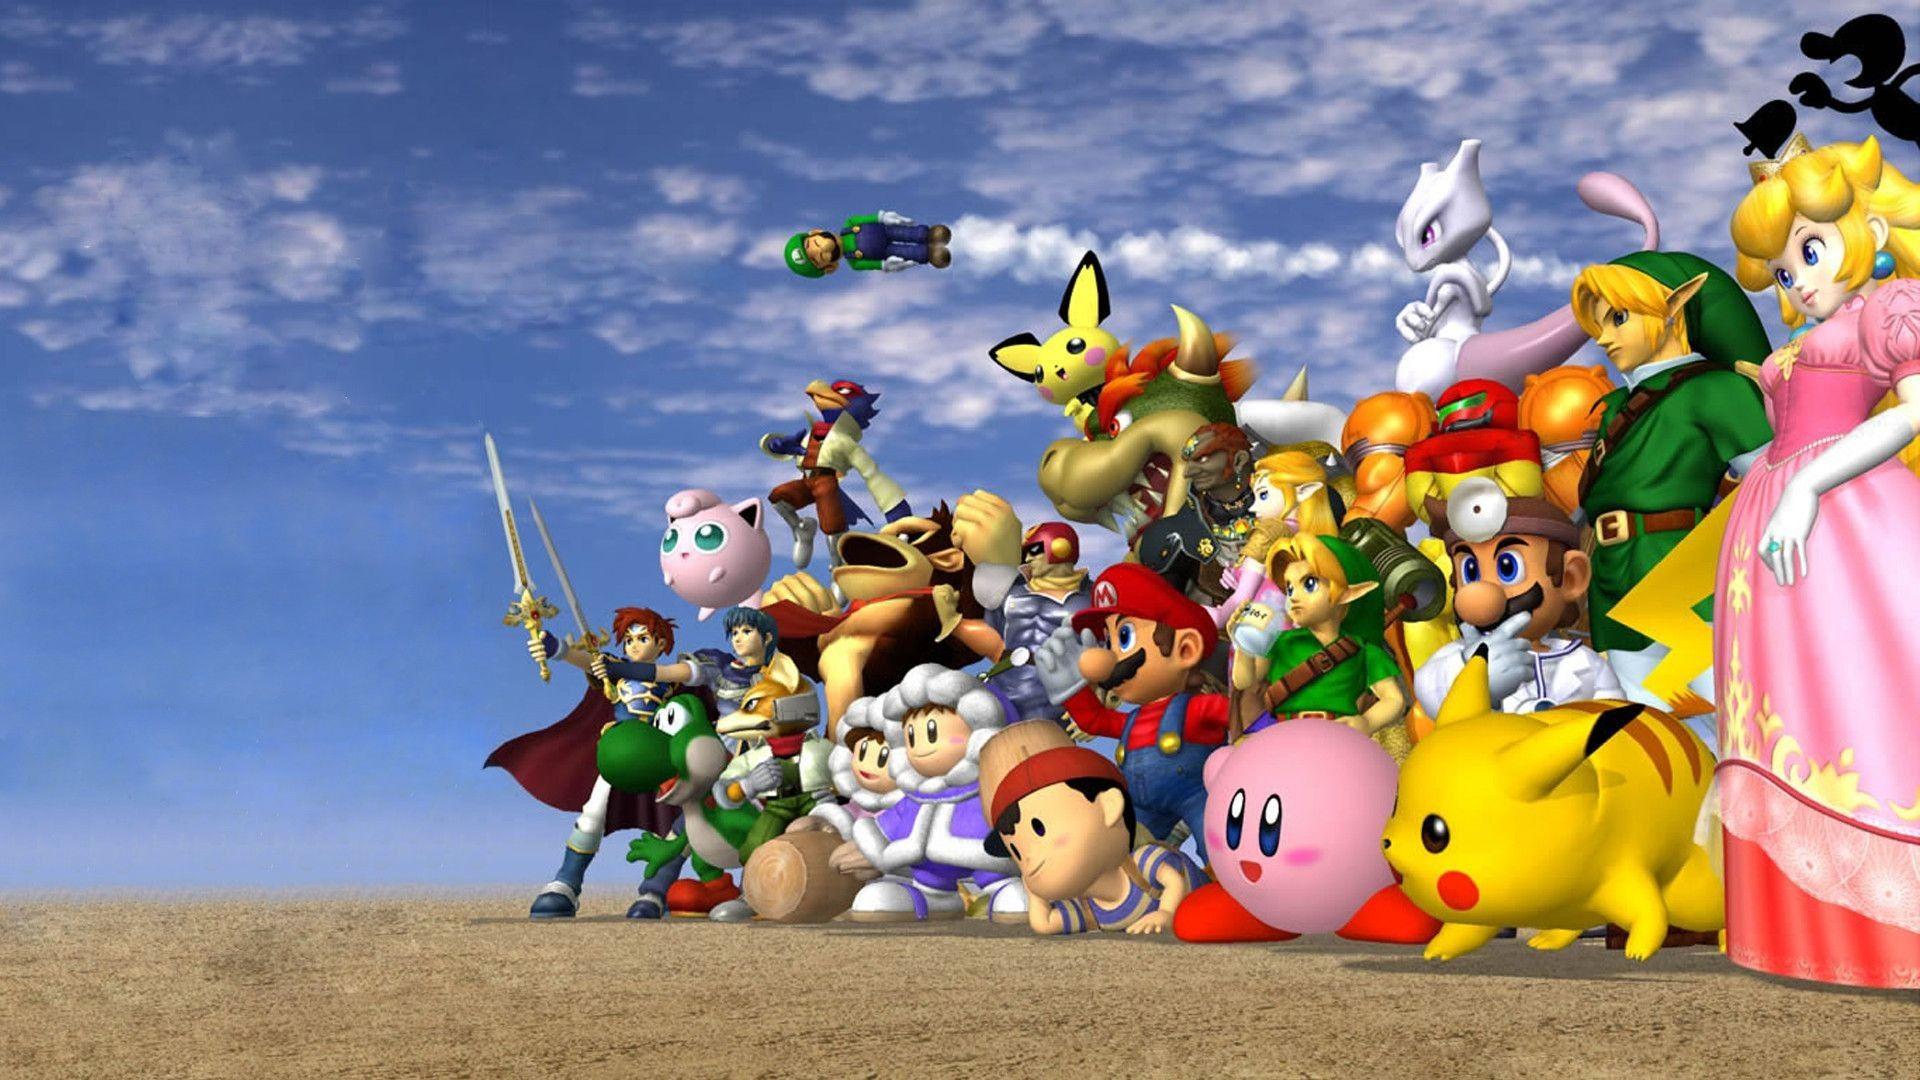 Cool Nintendo Wallpapers   Top Cool Nintendo Backgrounds 1920x1080